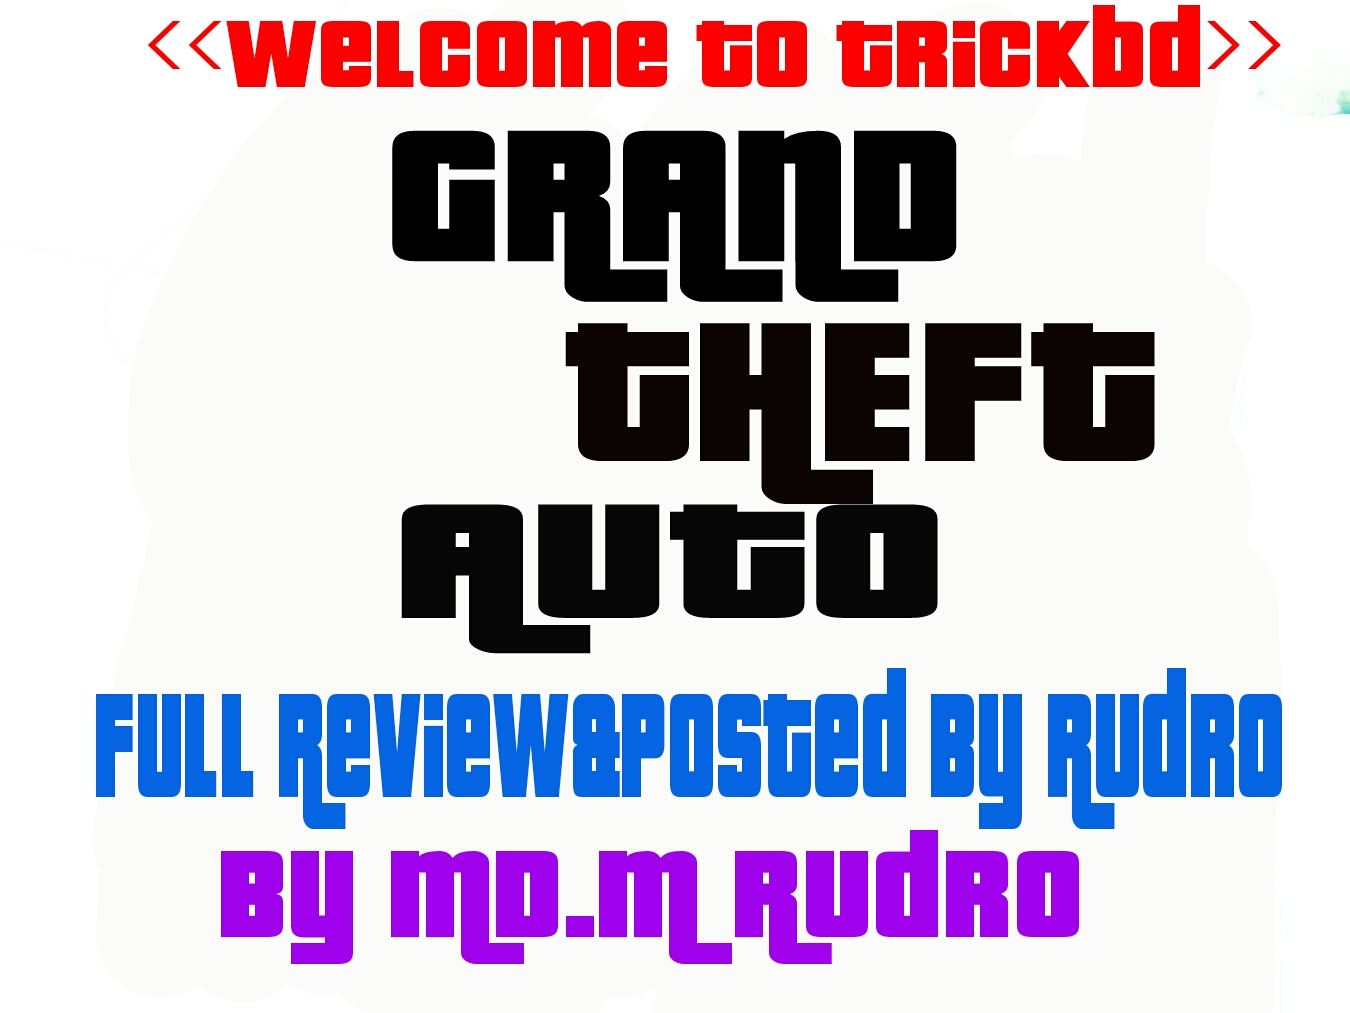 (Game][Mega Post] নিয়ে নিন GTA Vice City+Android Apk+Link Fixed+fully Offline+Reviews +মিশন কম্প্লিট করার ট্রিক্স (256 এমবি Ram এ চলবে)+Full Bangla Review– by Rudro